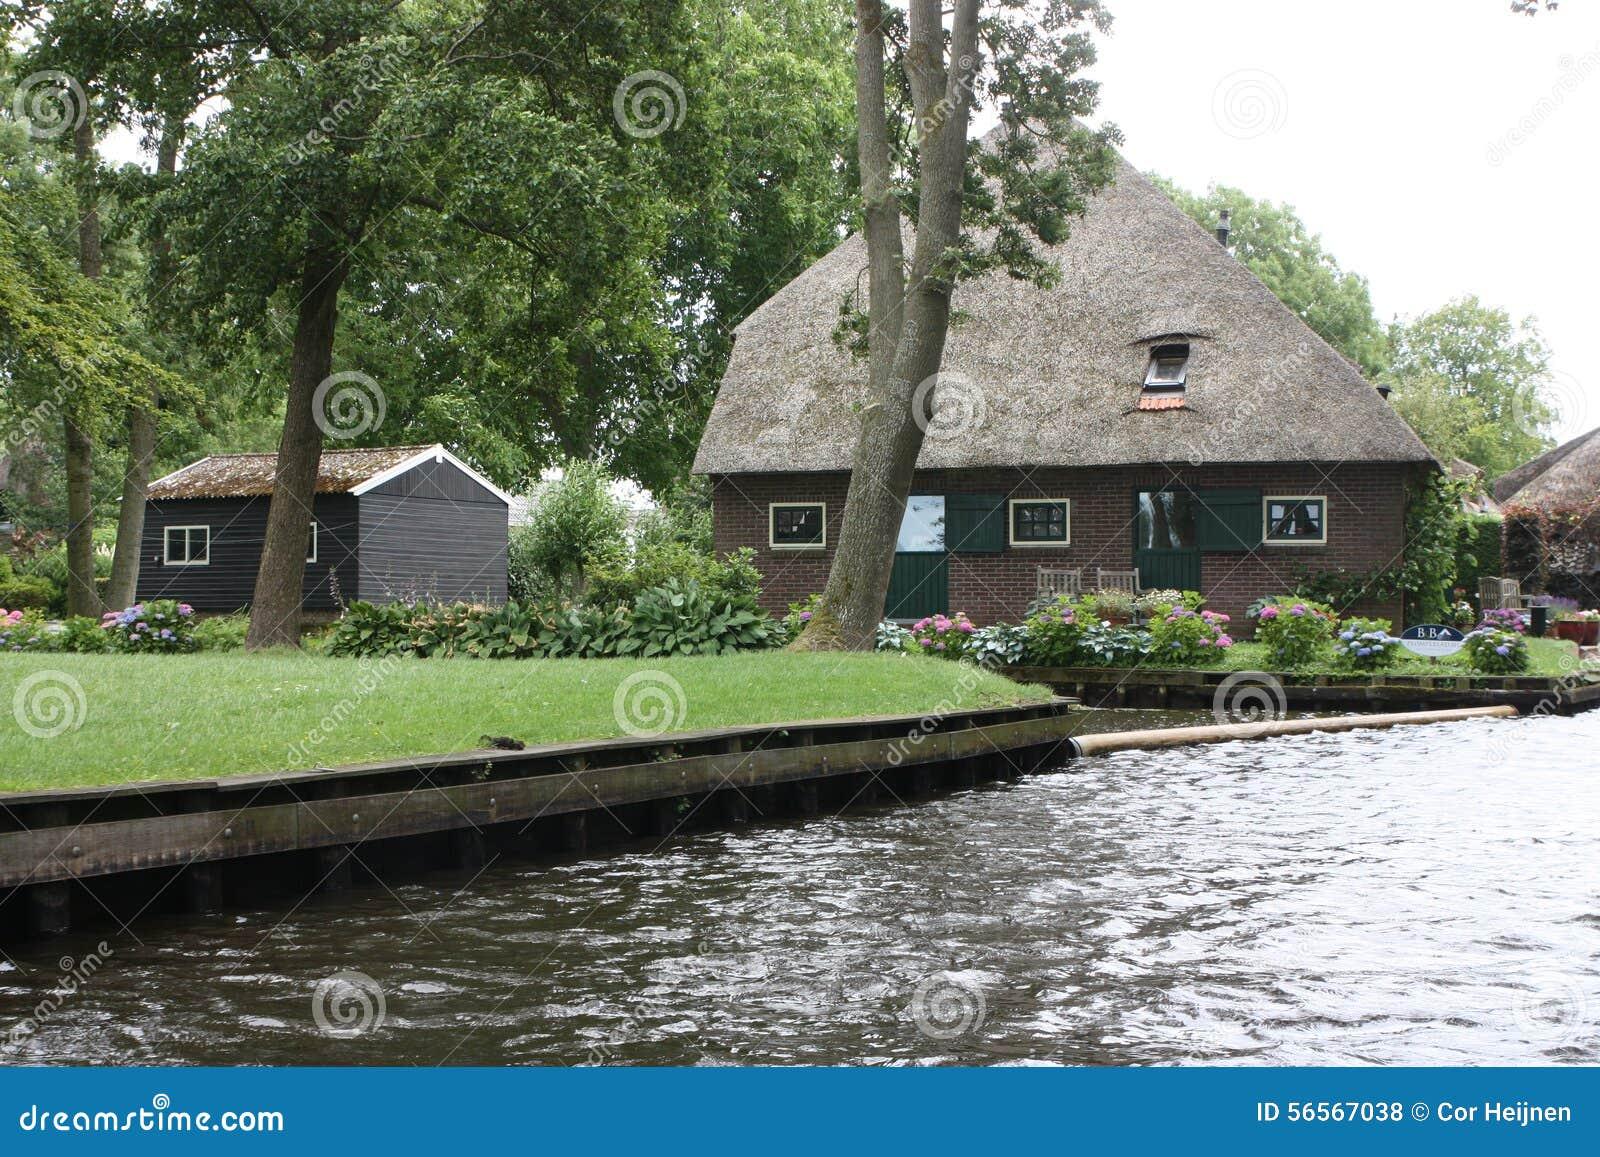 Download Giethoorn η ολλανδική Βενετία Στοκ Εικόνες - εικόνα από εξωτερικό, cityscape: 56567038